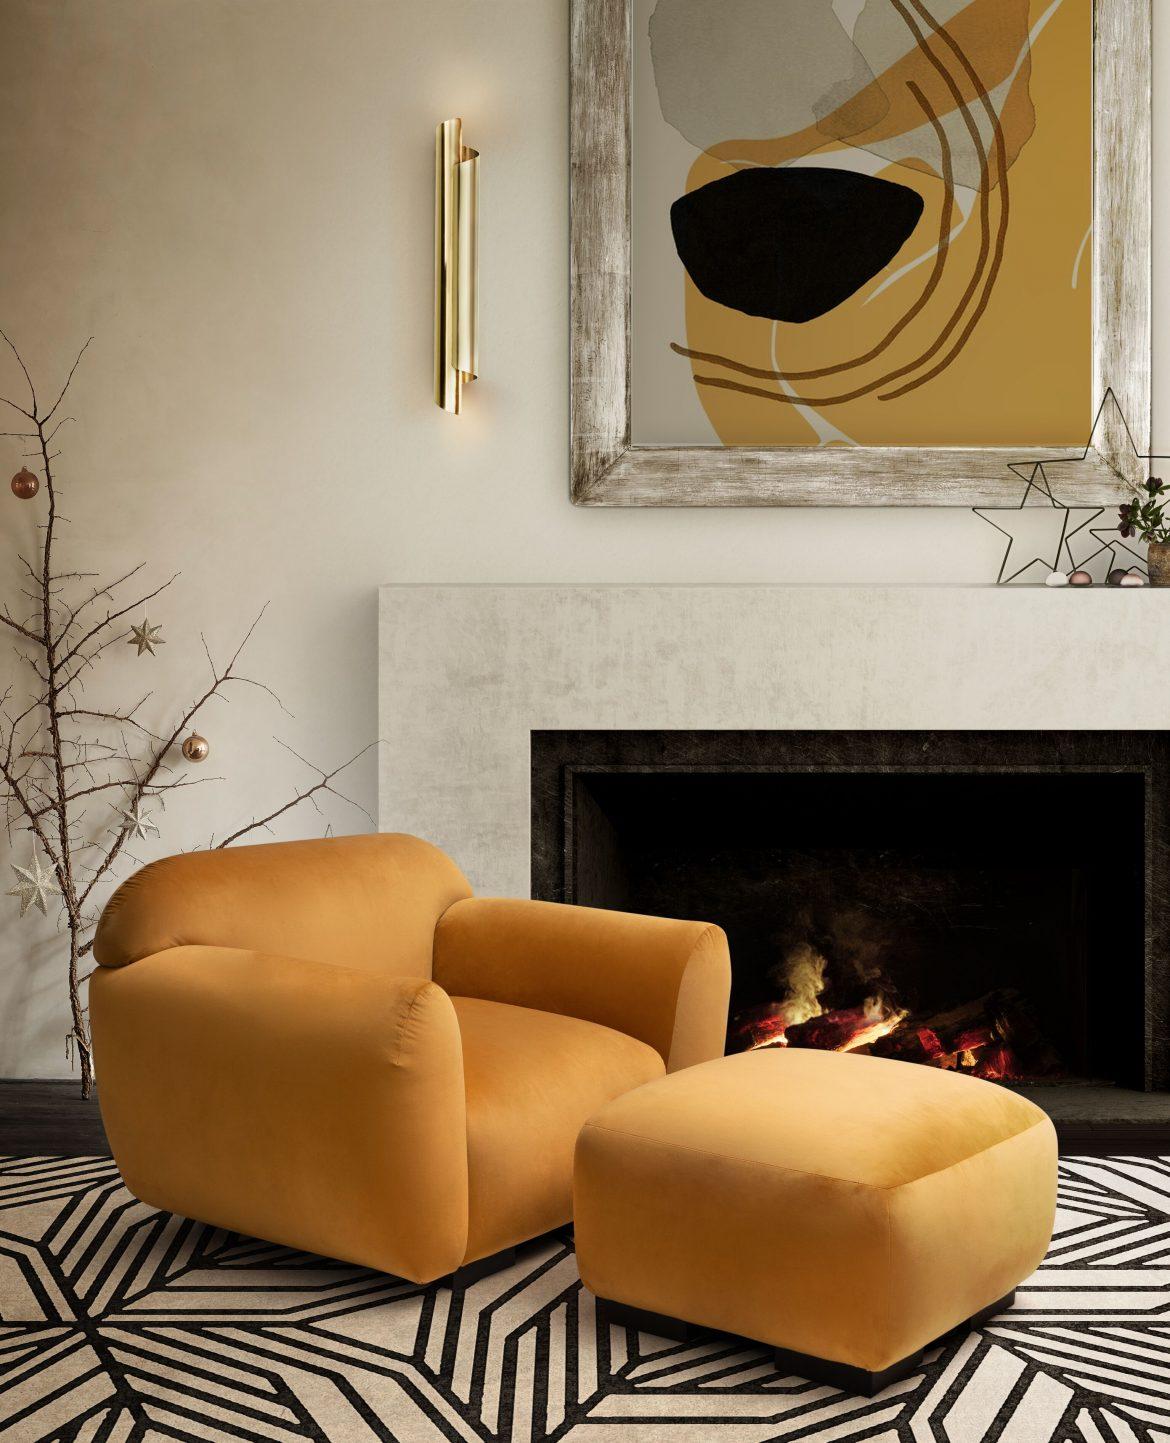 living room ideas 30 Best Living Room Ideas For 2020 best living room ideas 2020 11